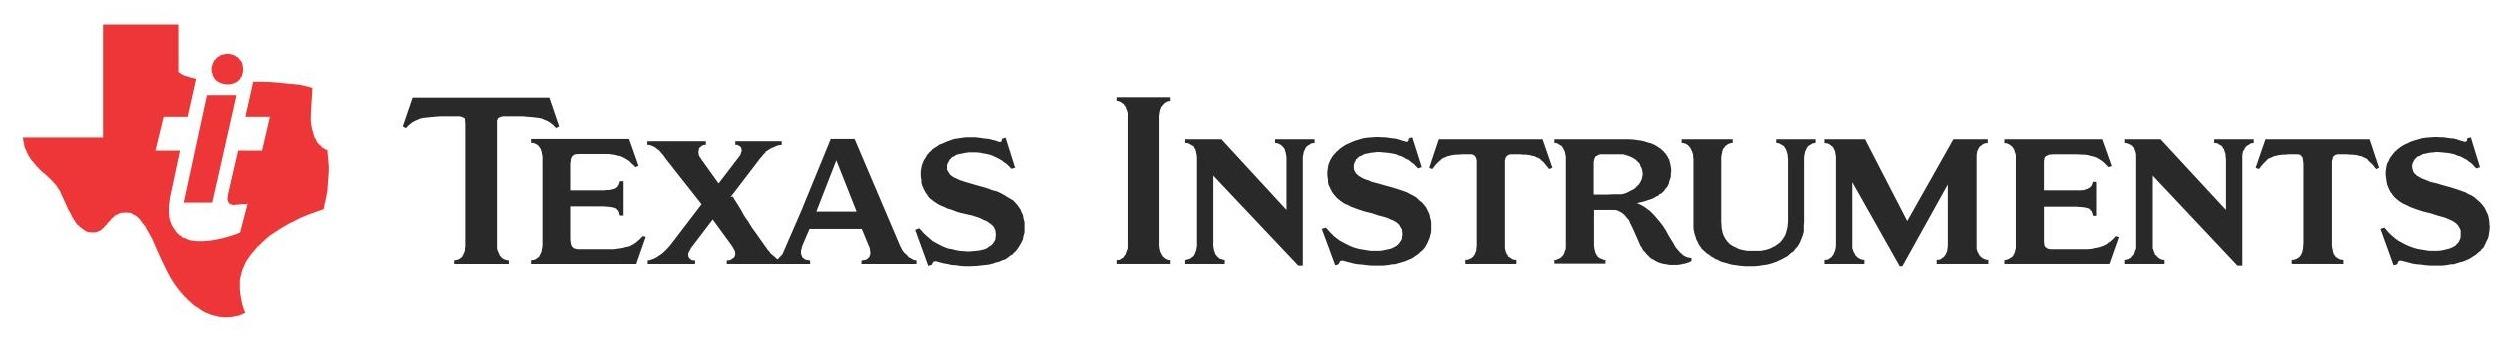 Texas_Instruments_Logo